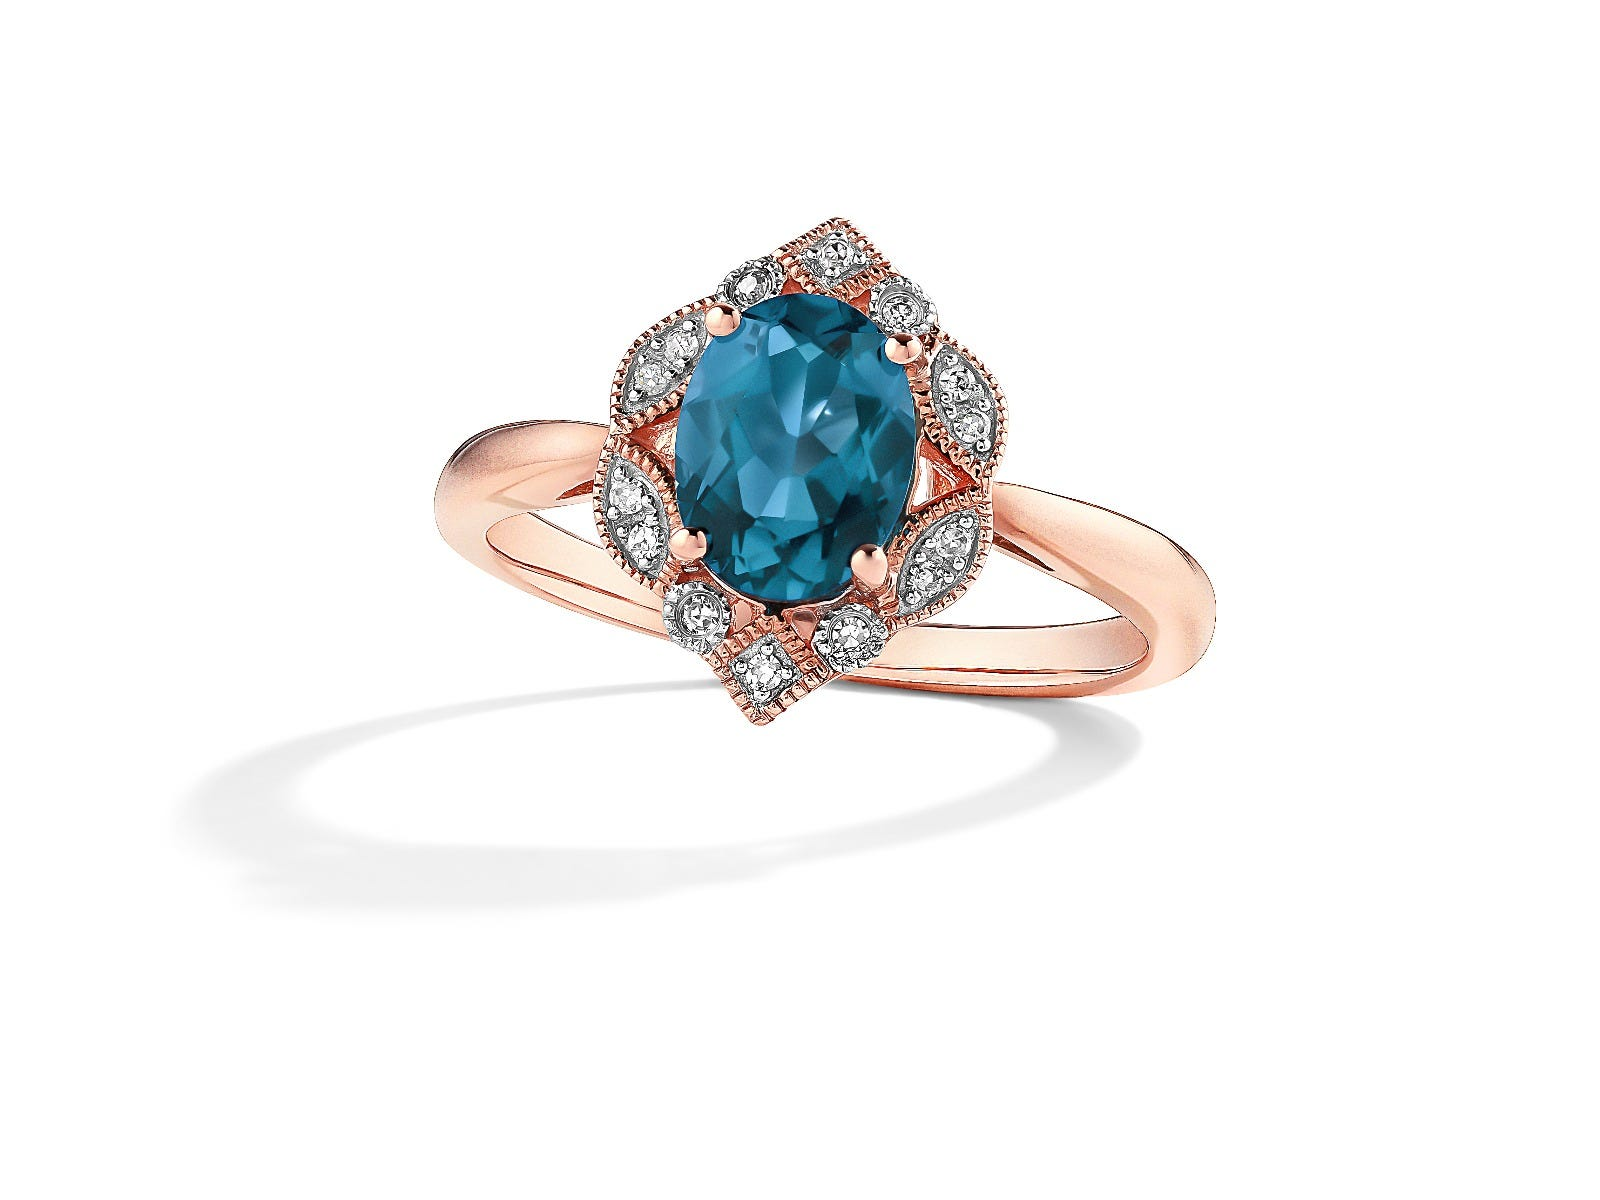 Oval London Blue Topaz & Diamond Ring in 10k Rose Gold